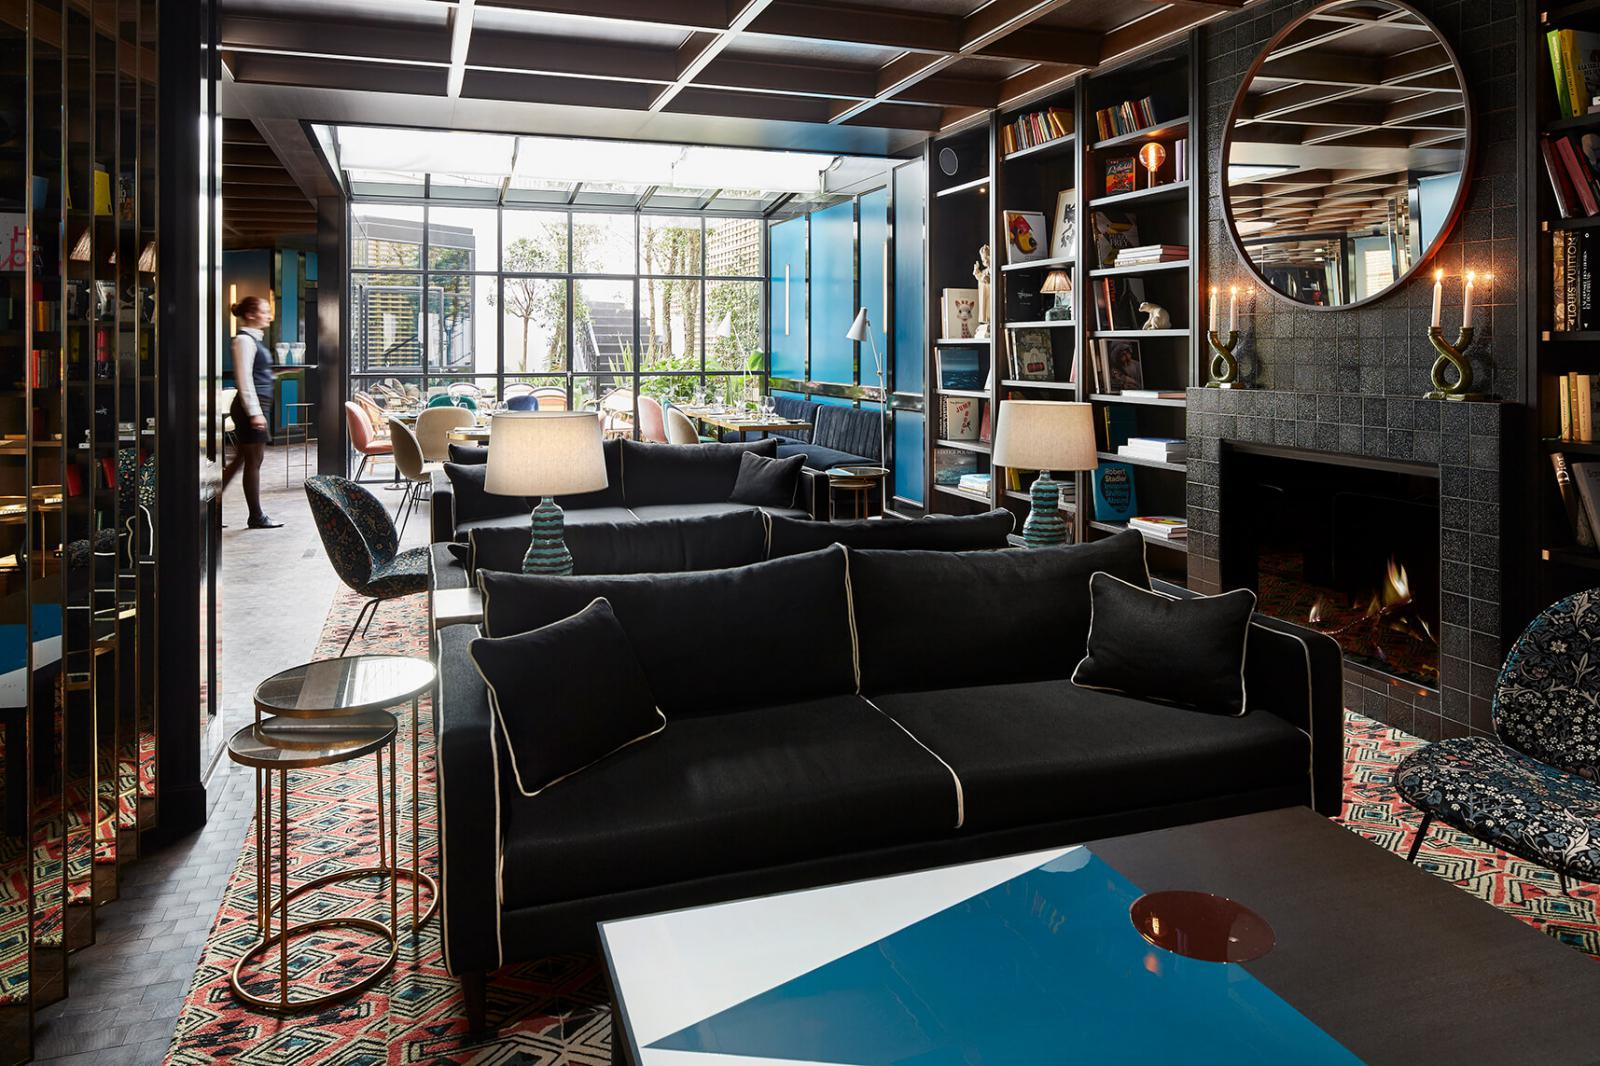 le-roch-hotel-spa-lobby-51399-1600-900-auto